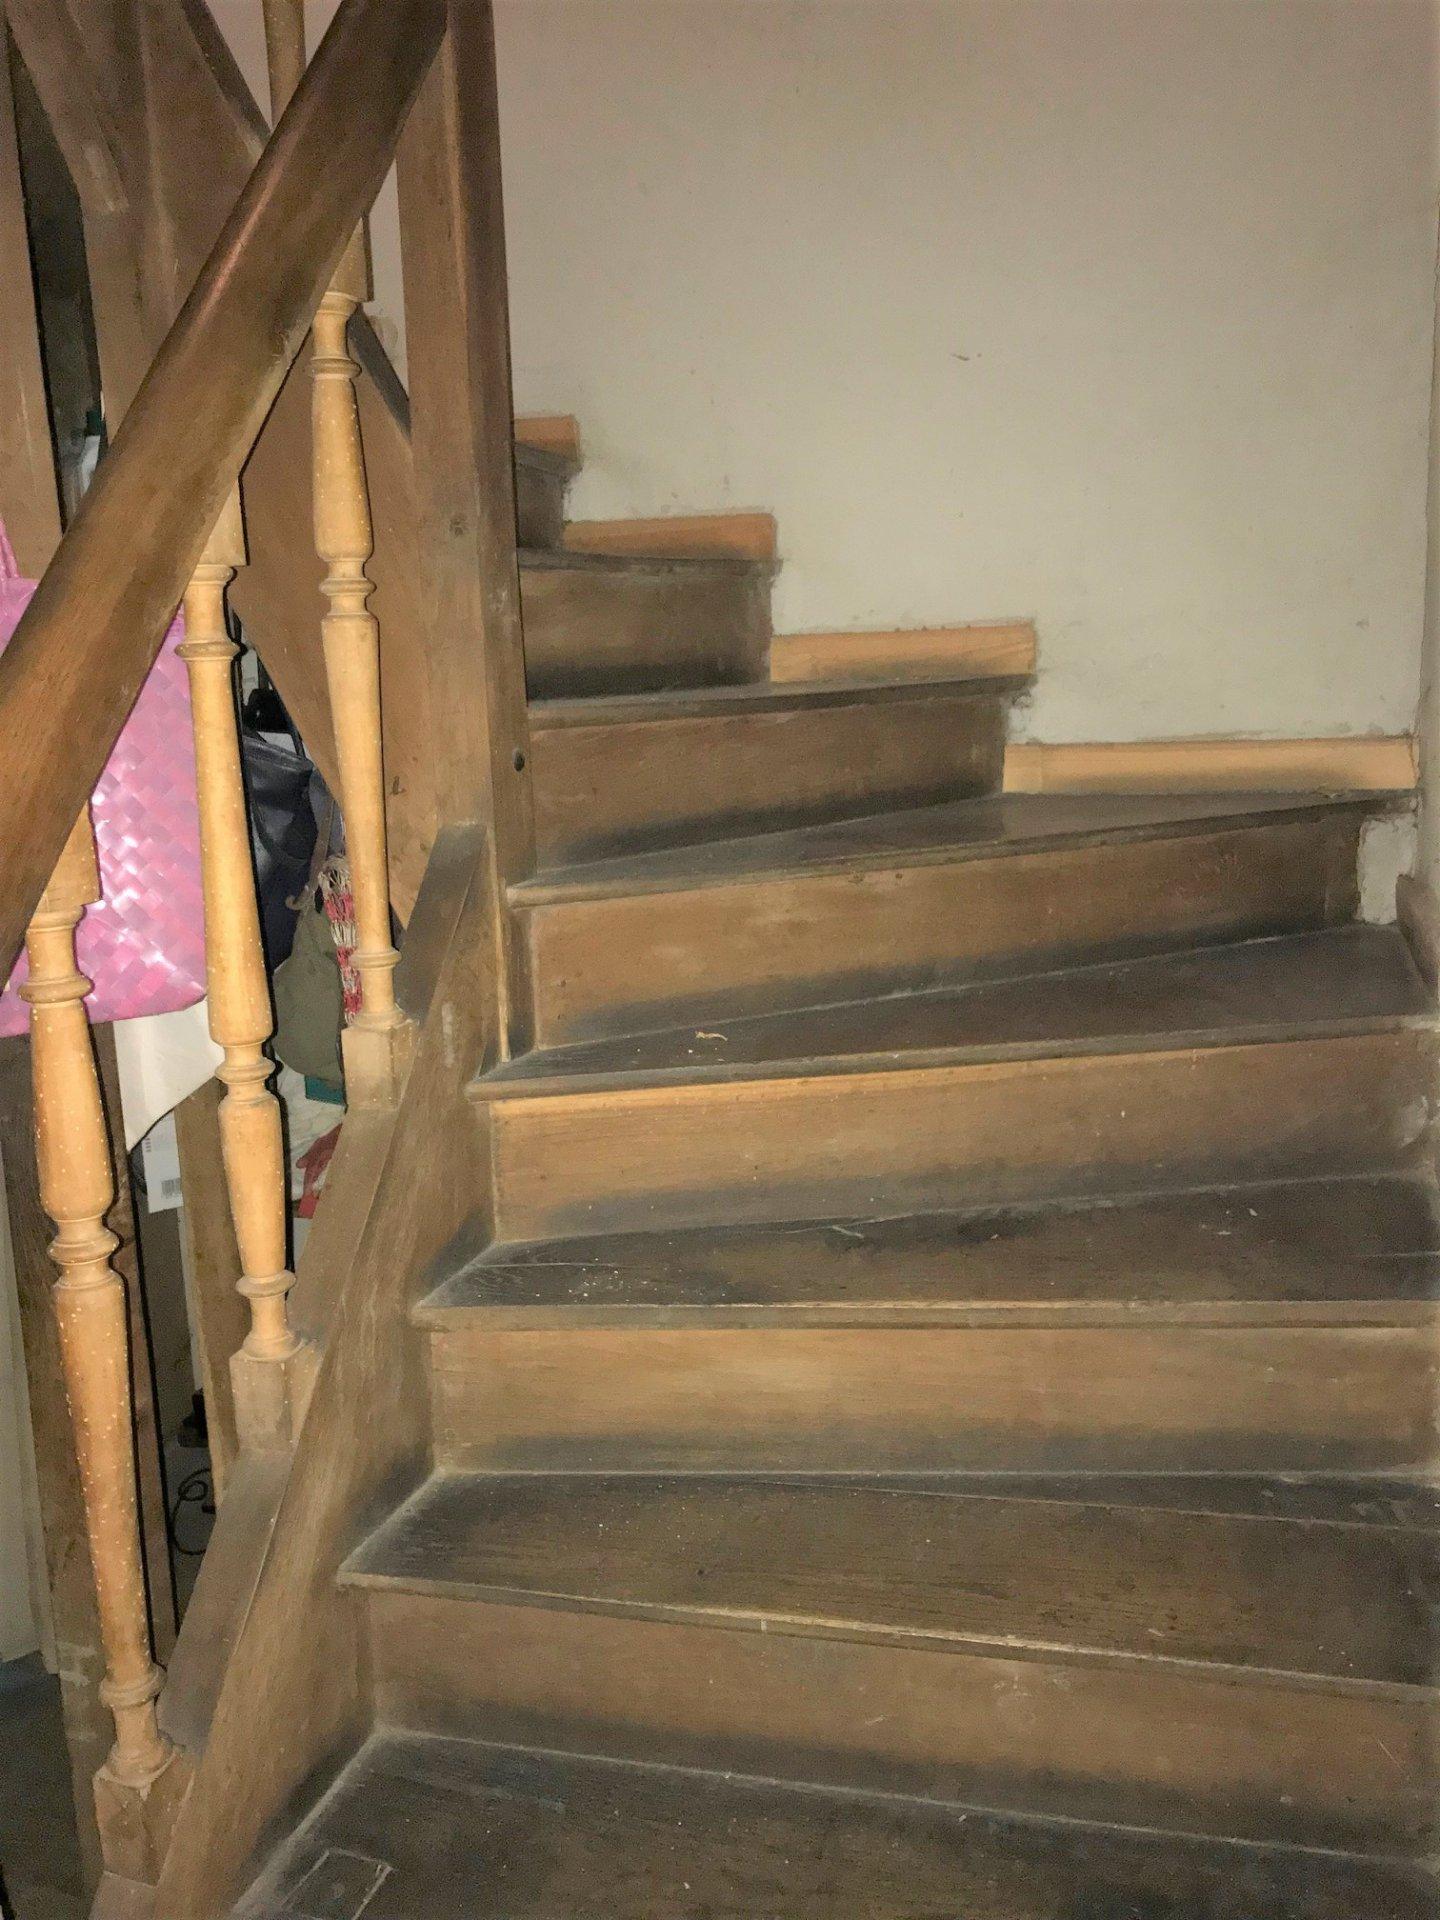 Escalier ancien en bois